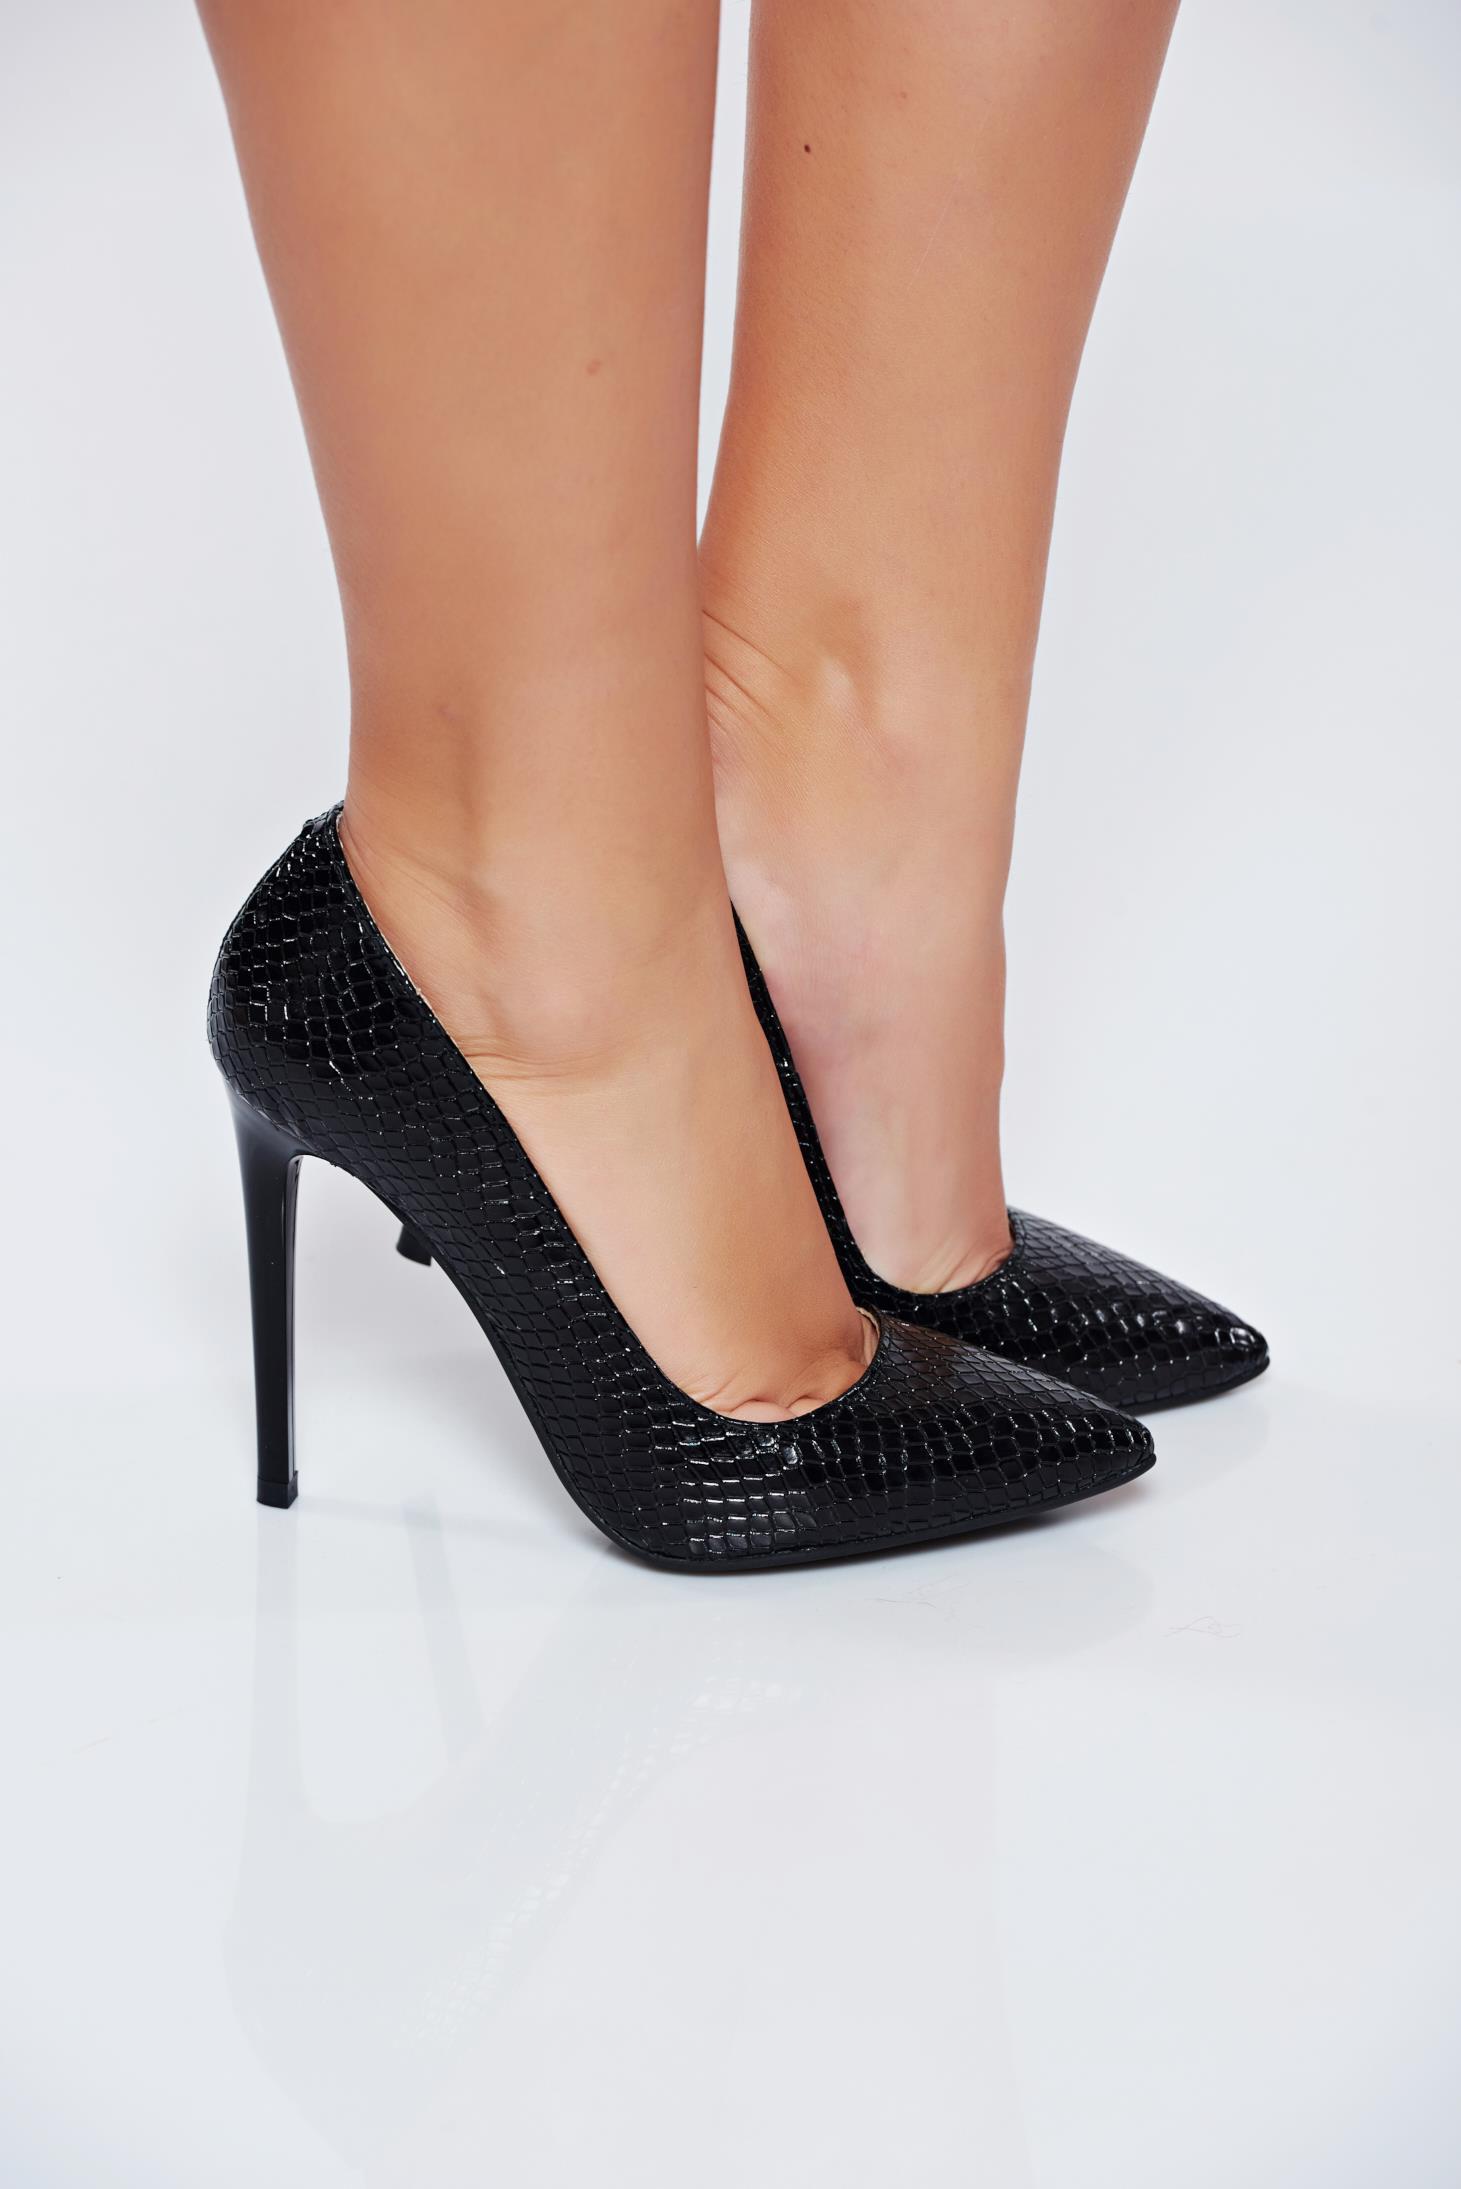 Pantofi stiletto negri din piele naturala elegant cu toc inalt